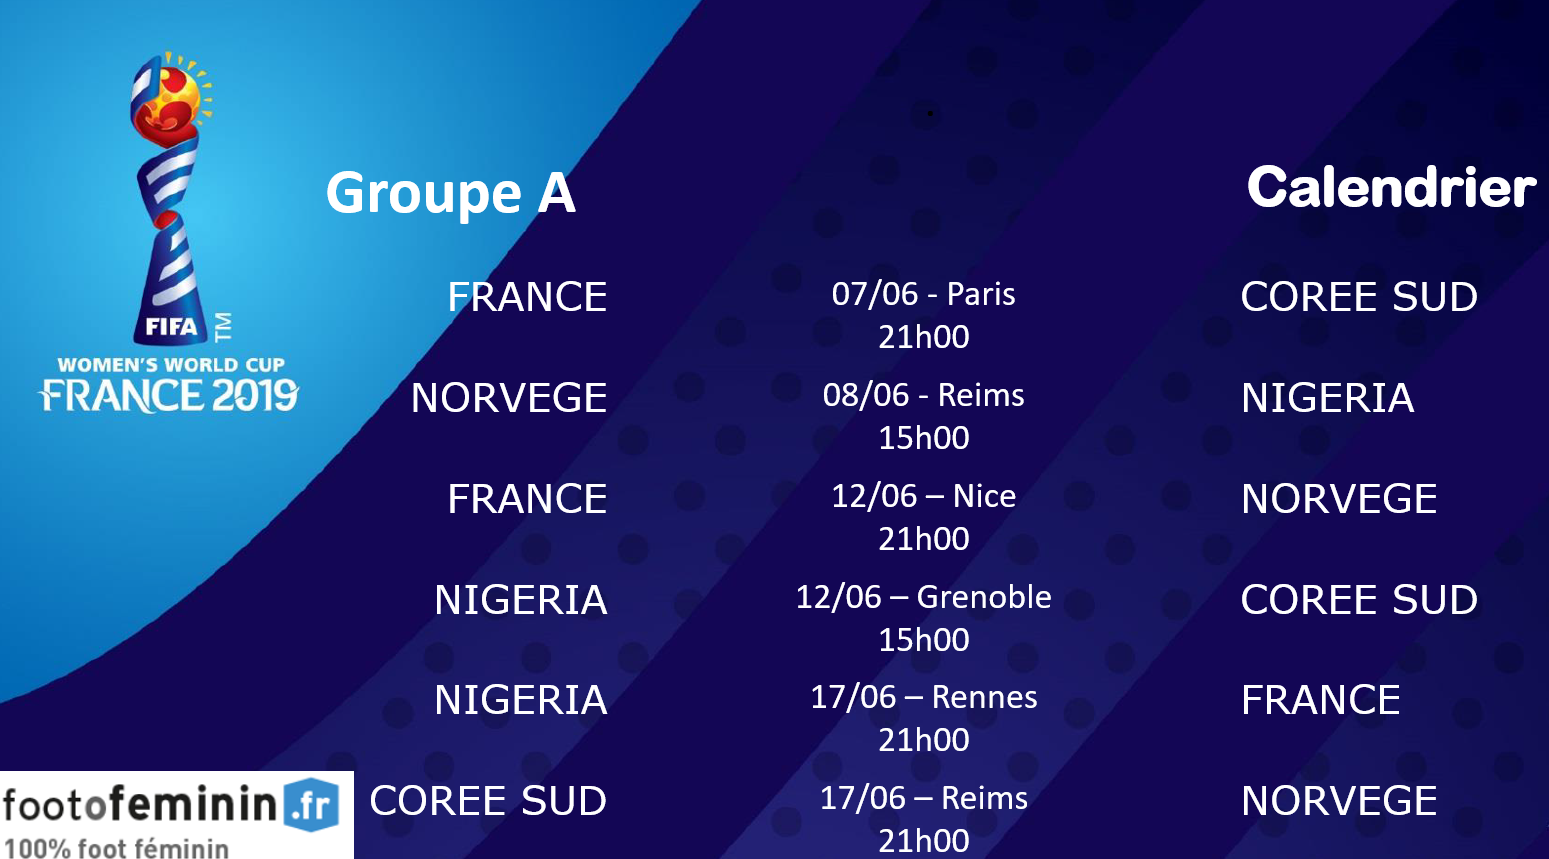 Mondial Feminin France 2019 Calendrier.Eliminatoires Coupe Du Monde 2019 Forums Ol Fr